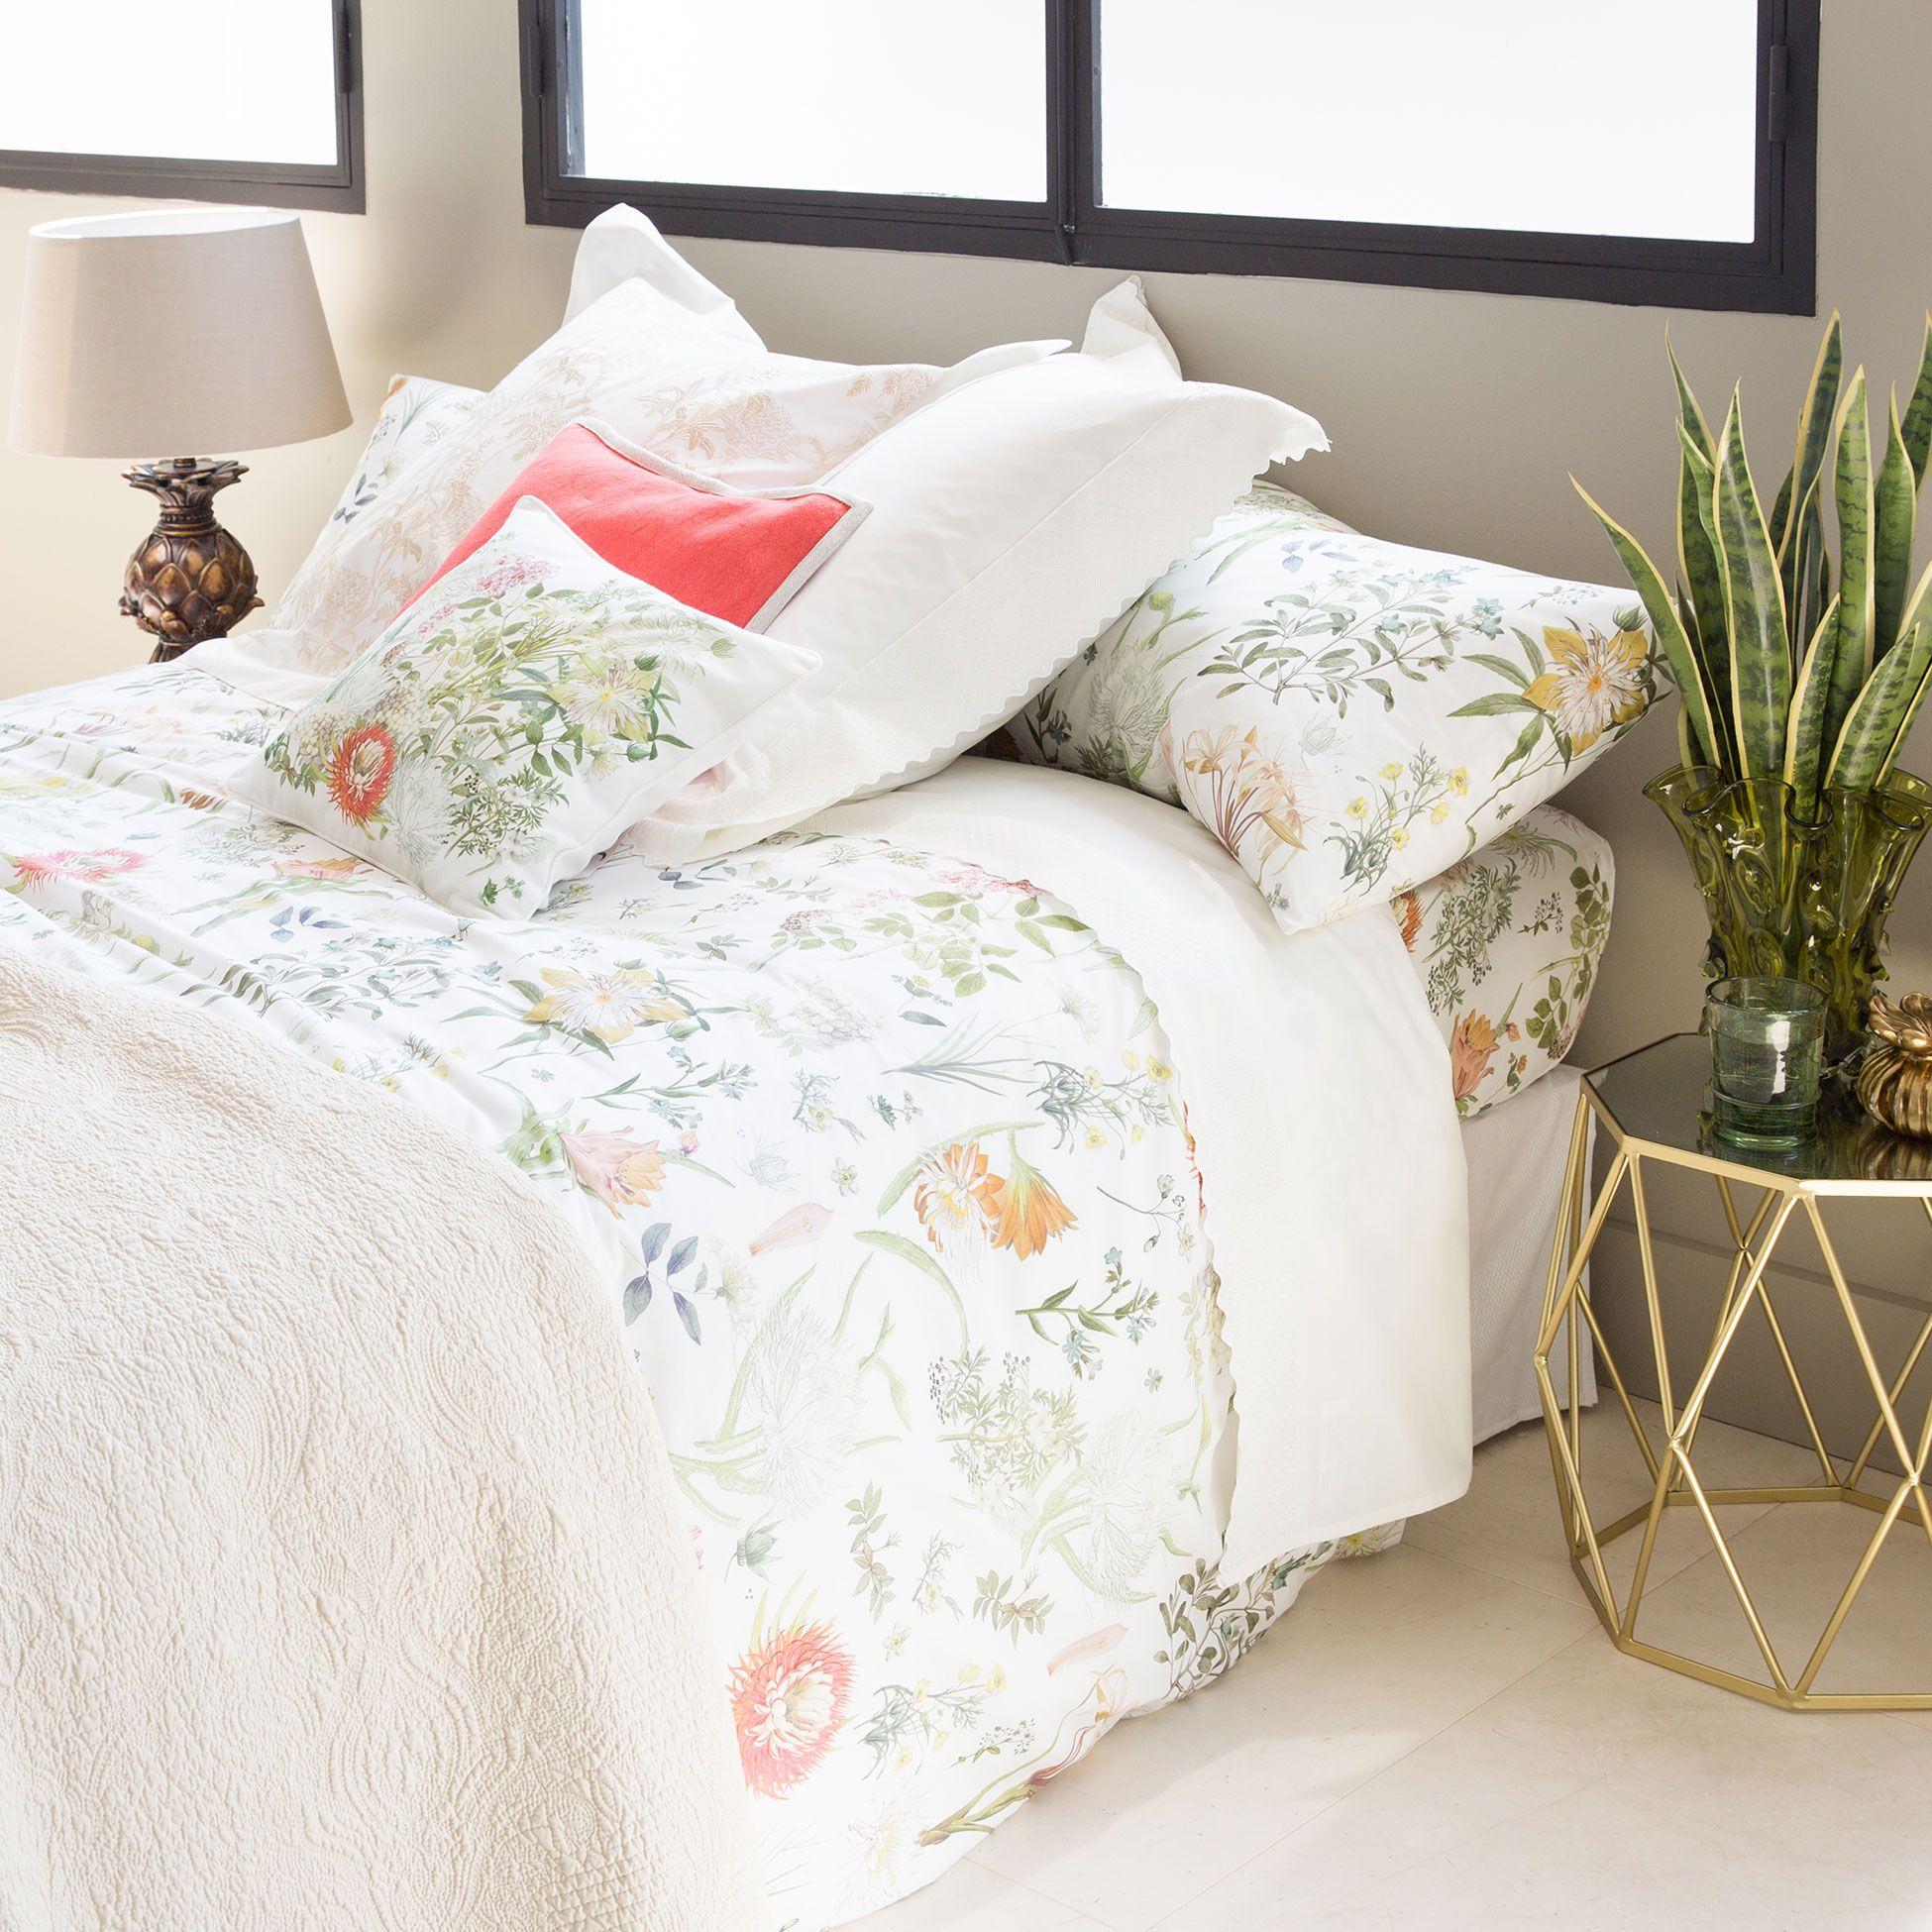 Do It Yourself Home Design: SÁBANAS Y FUNDAS FLORES SILVESTRES